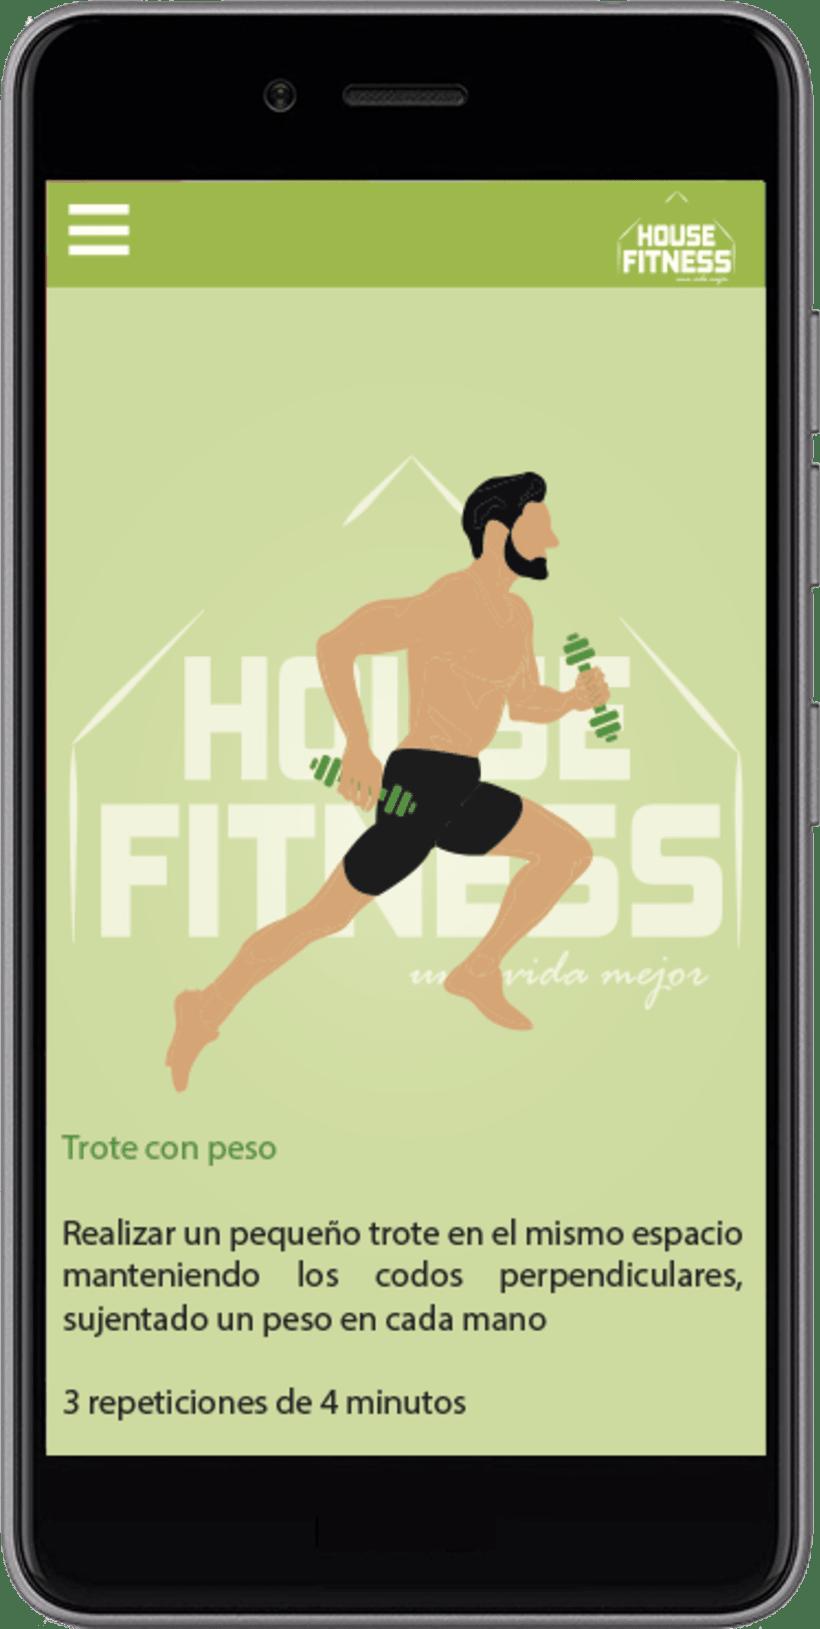 Desarollo de App House Fitness 4